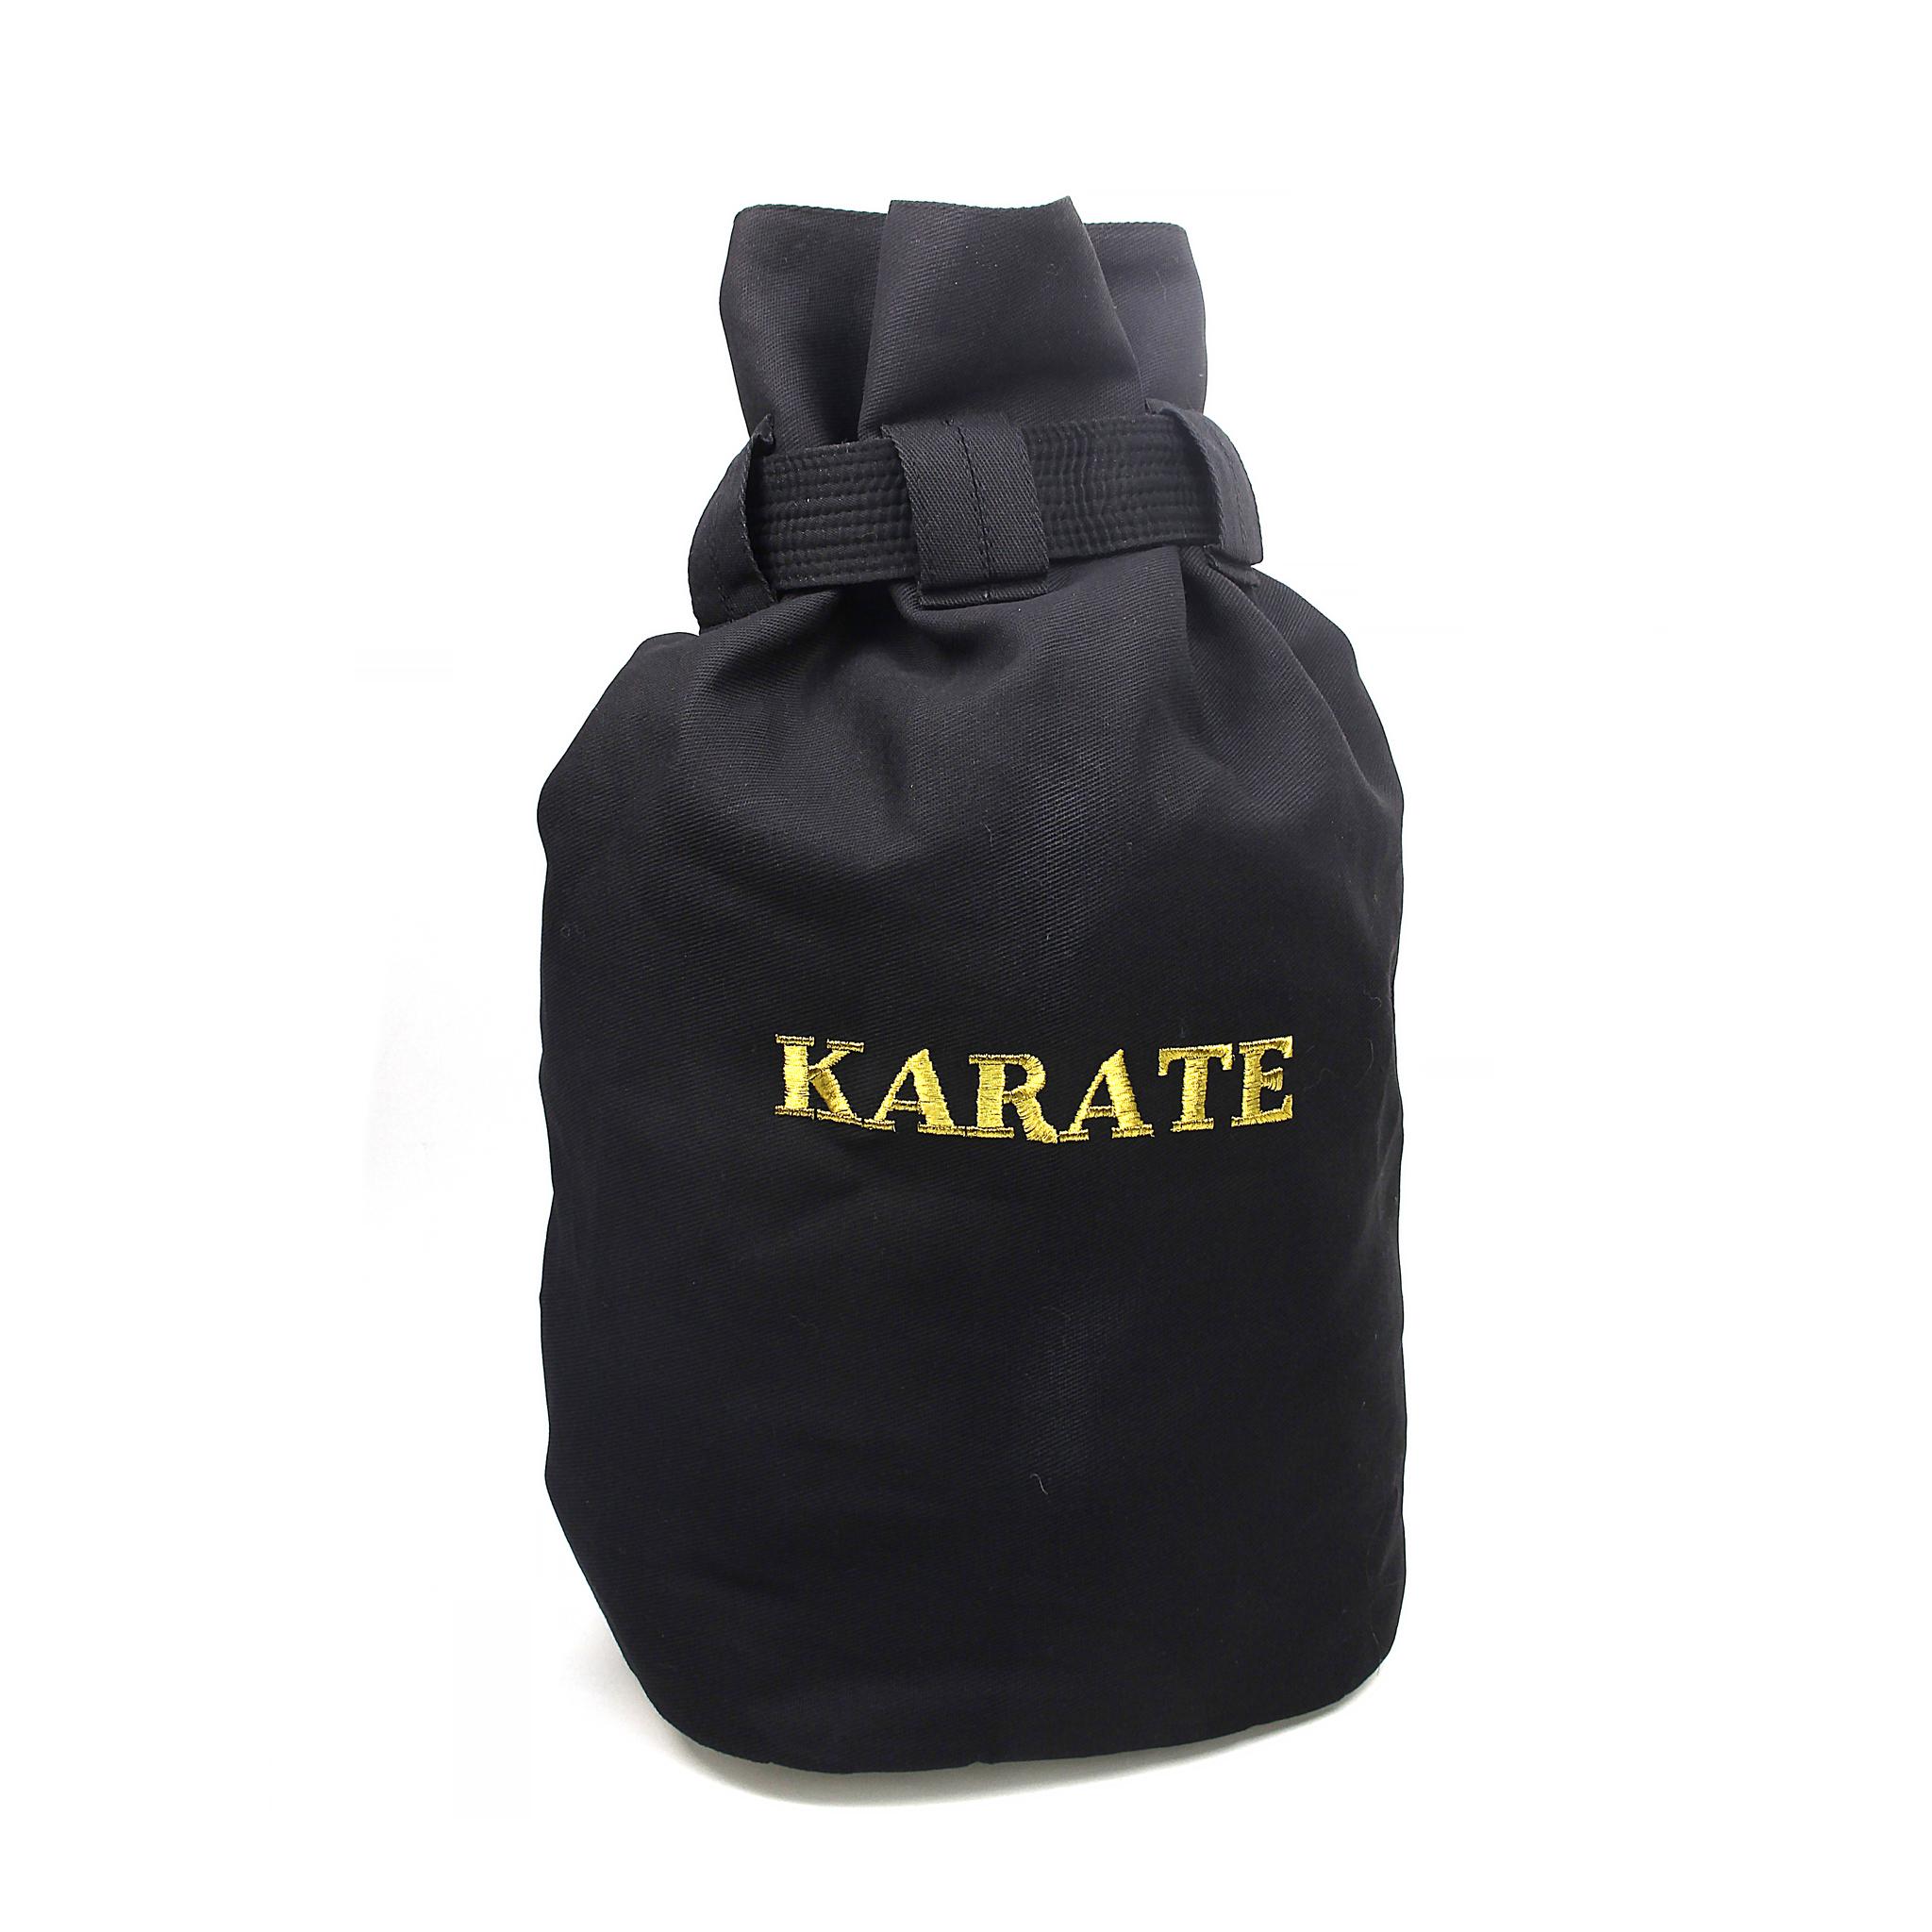 Сумки Сумка-мешок для каратэ _MG_0741.jpg